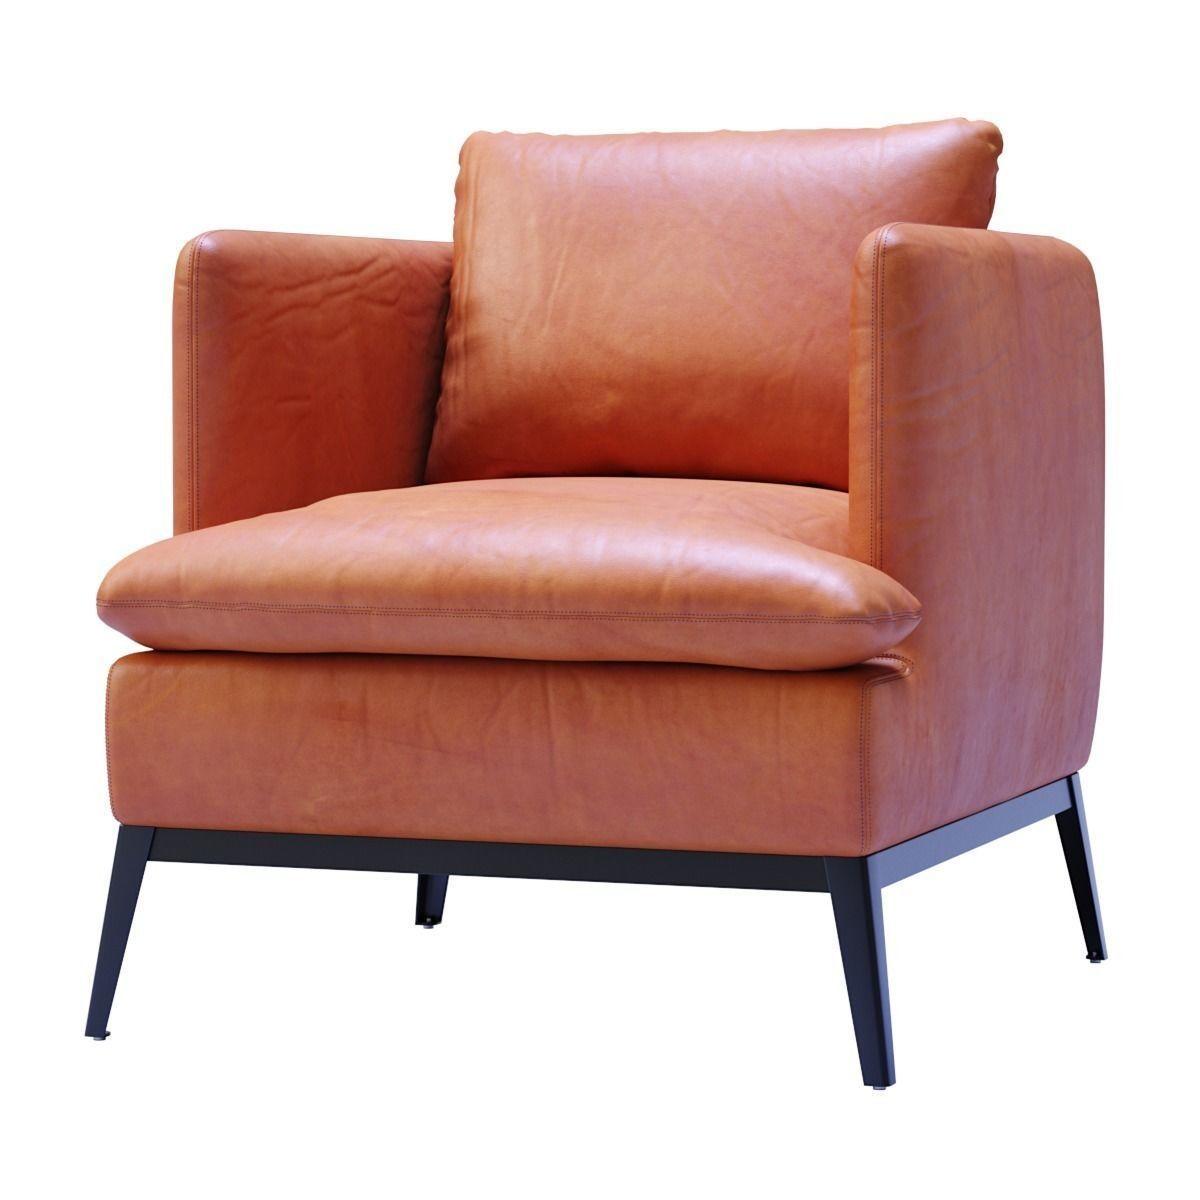 Remarkable Lewis Classic Leather Chair Cognac 3D Model Creativecarmelina Interior Chair Design Creativecarmelinacom